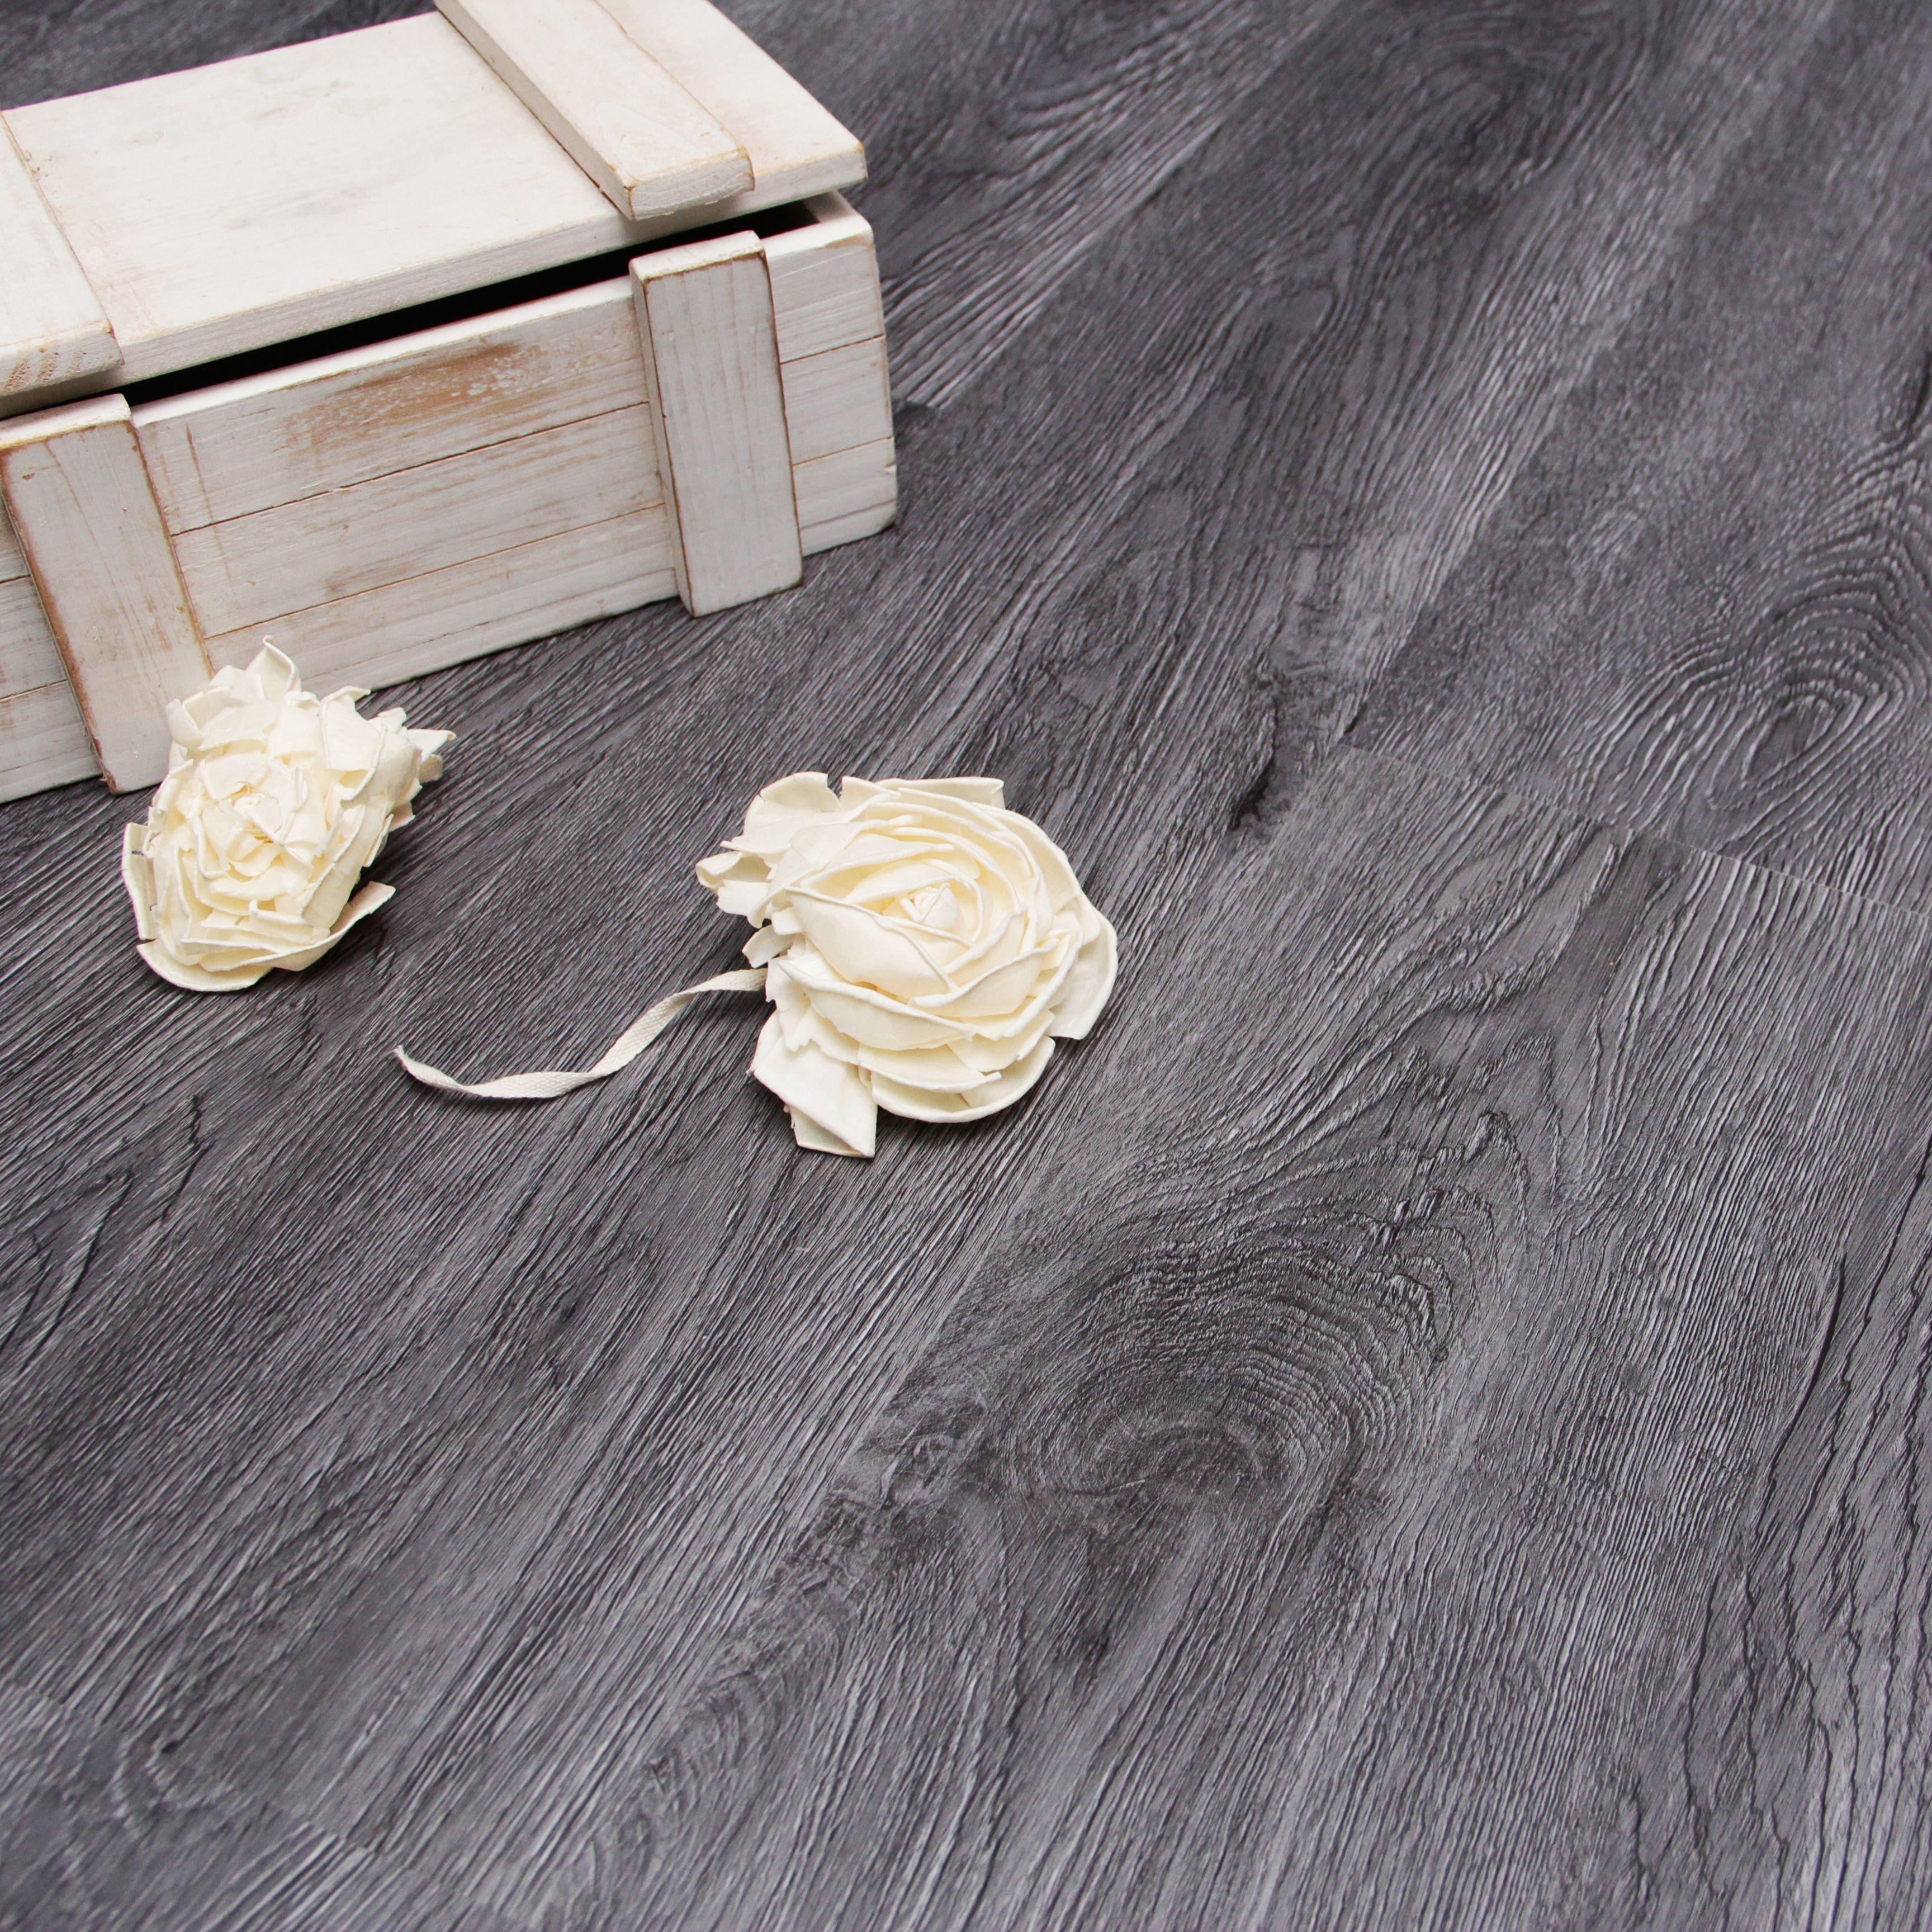 Charcoal Effect Wood Finish Luxury Vinyl Click Flooring